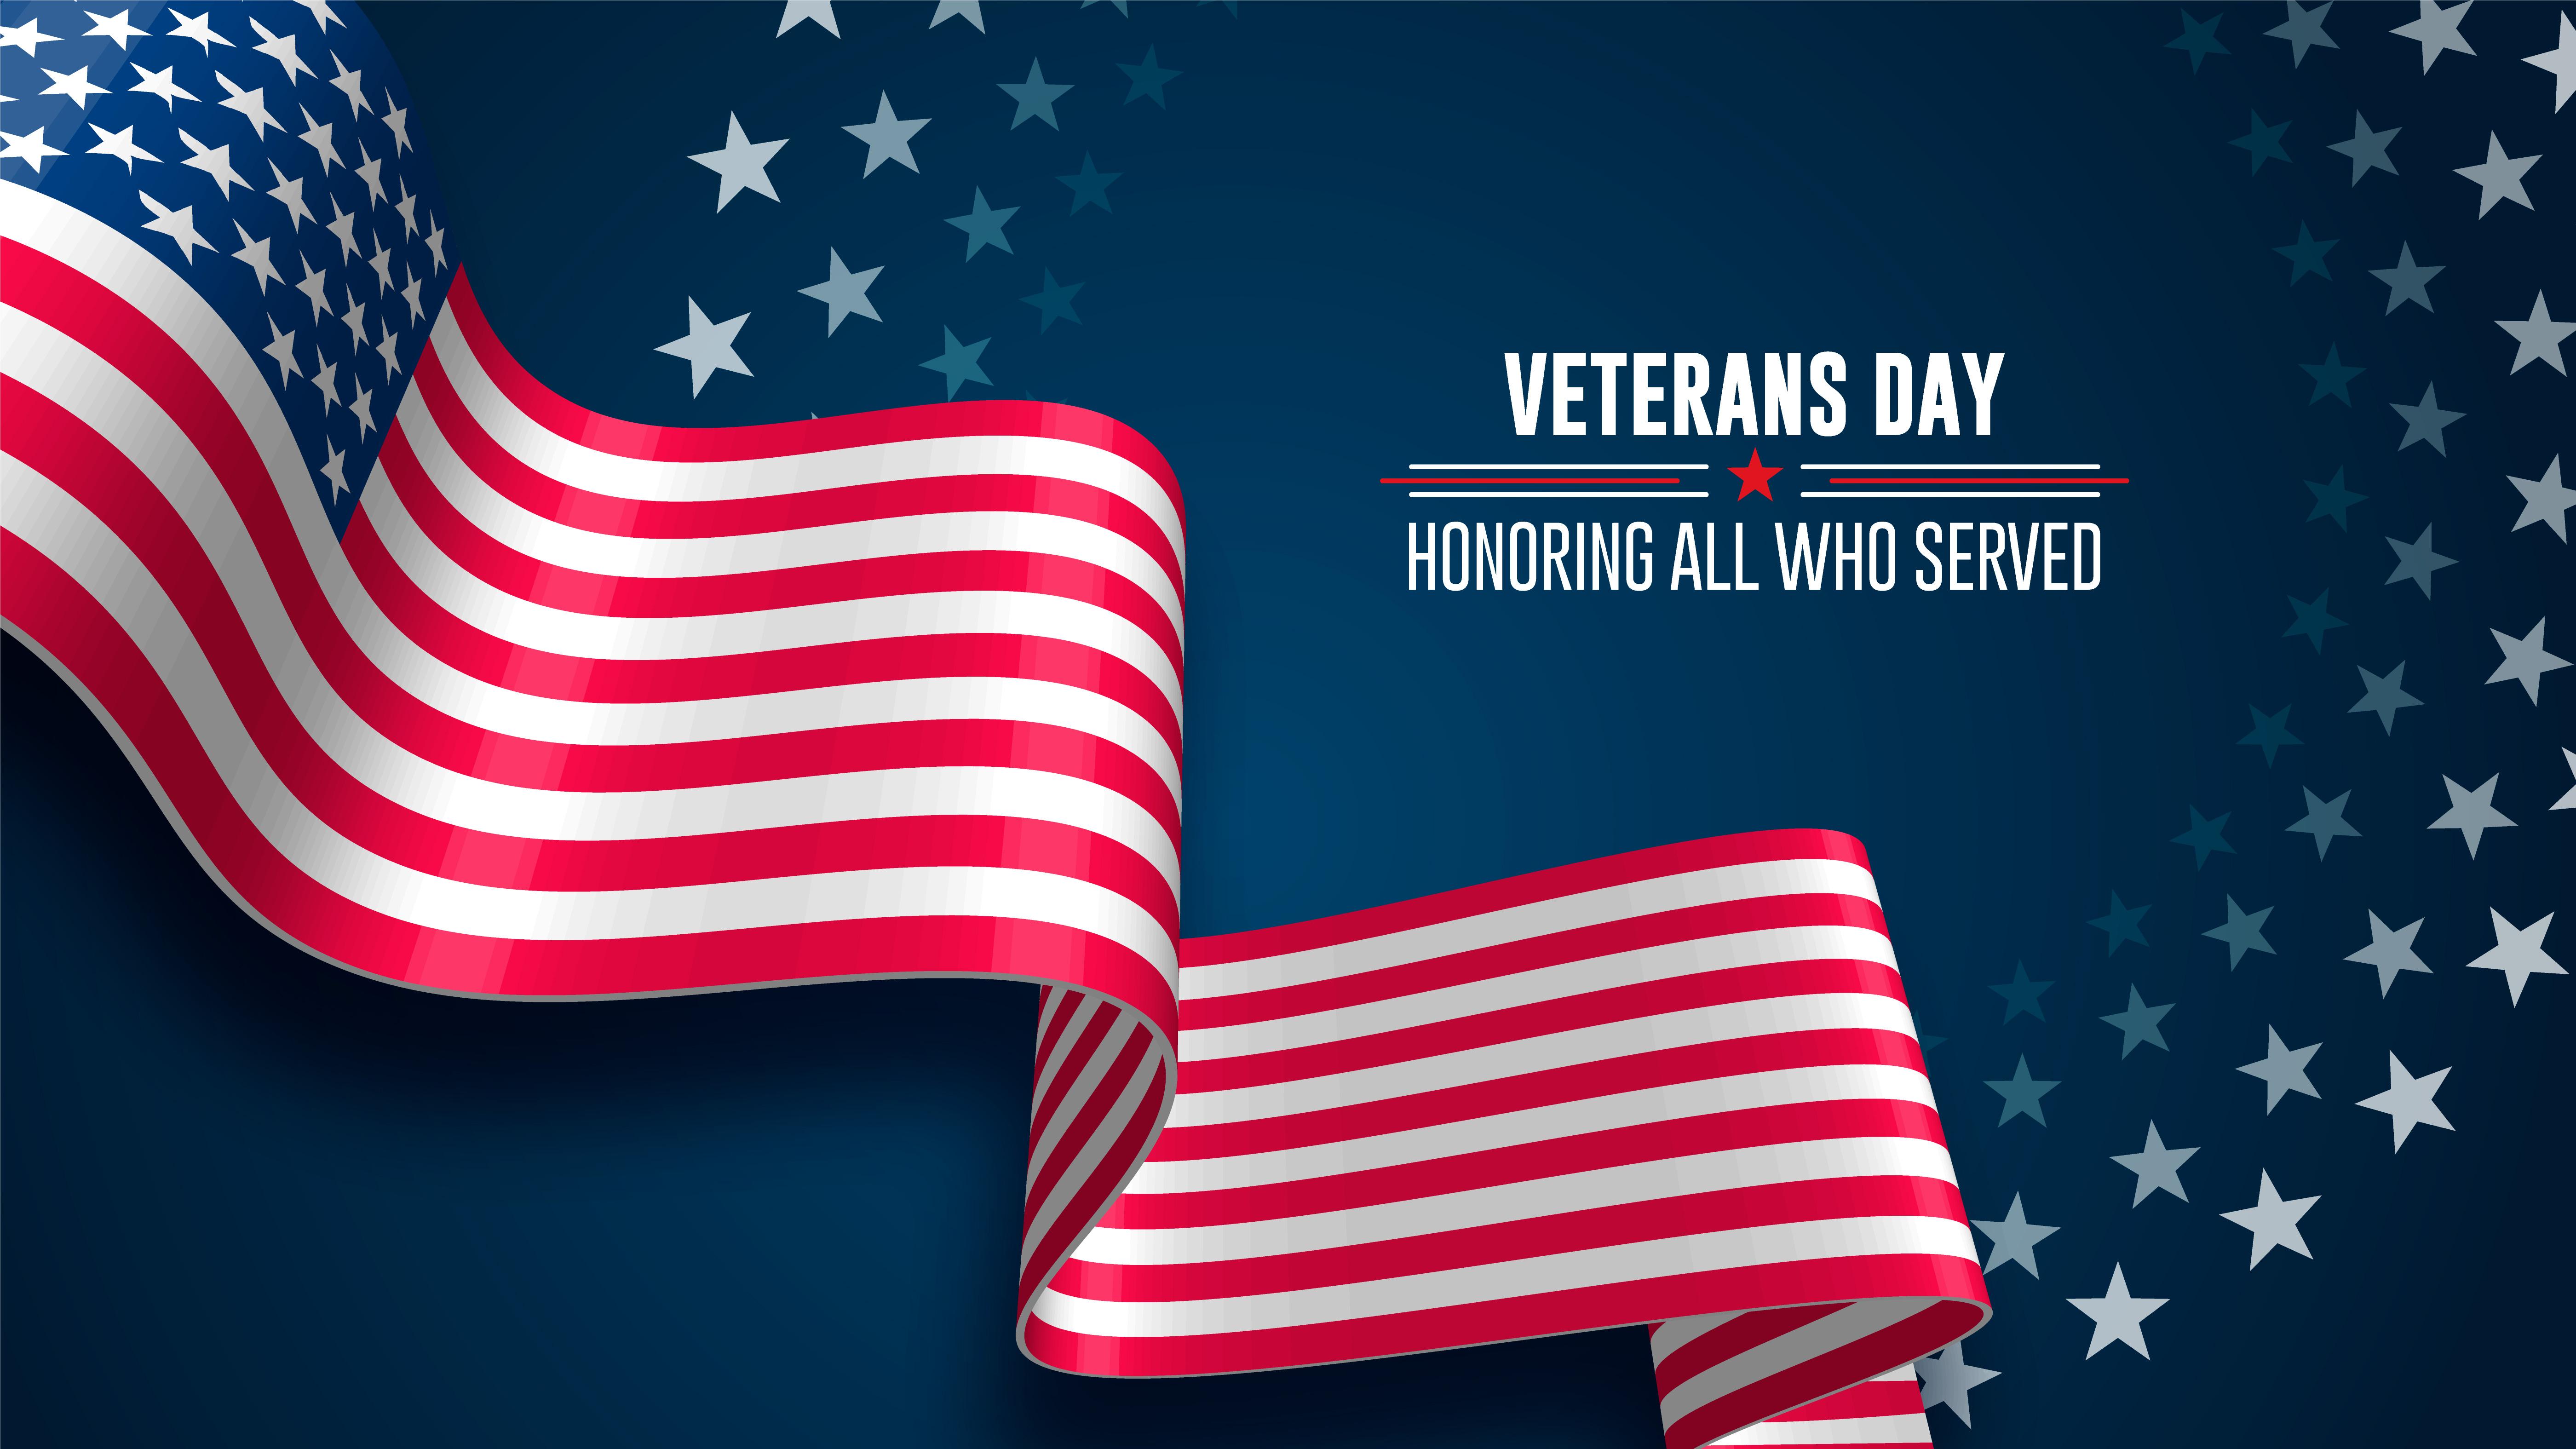 Veterans Day Flag Background - Download Free Vectors, Clipart Graphics & Vector Art